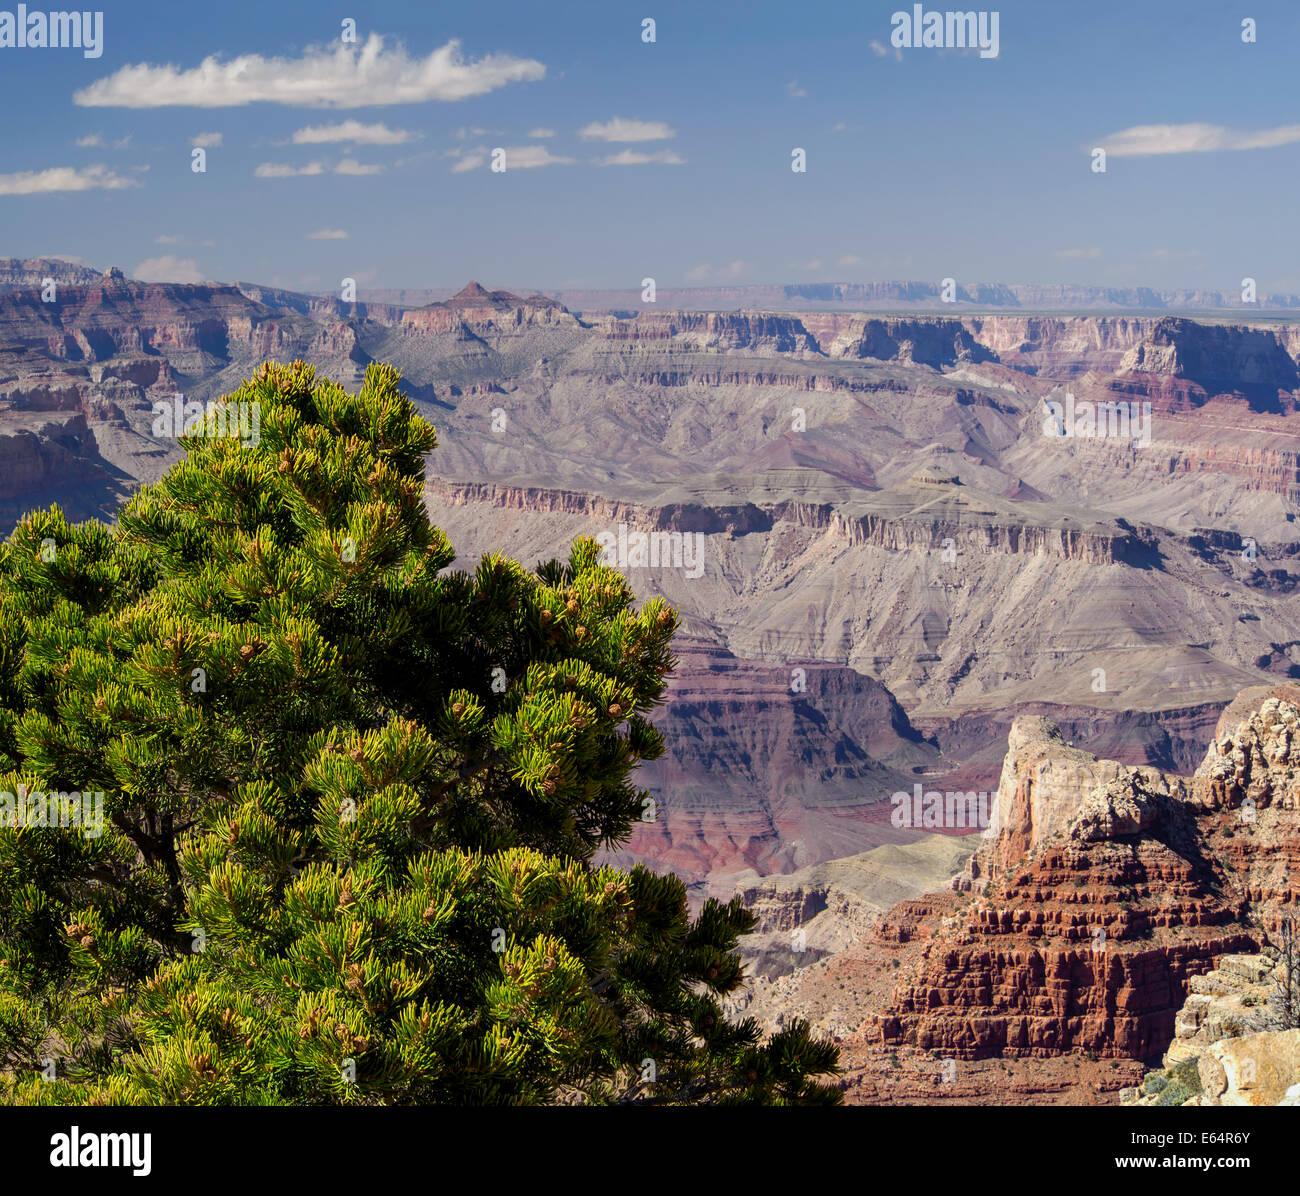 Grand Canyon south rim view from Pipe Creek Vista, Arizona USA, 2014 scenic landscape photography Stock Photo